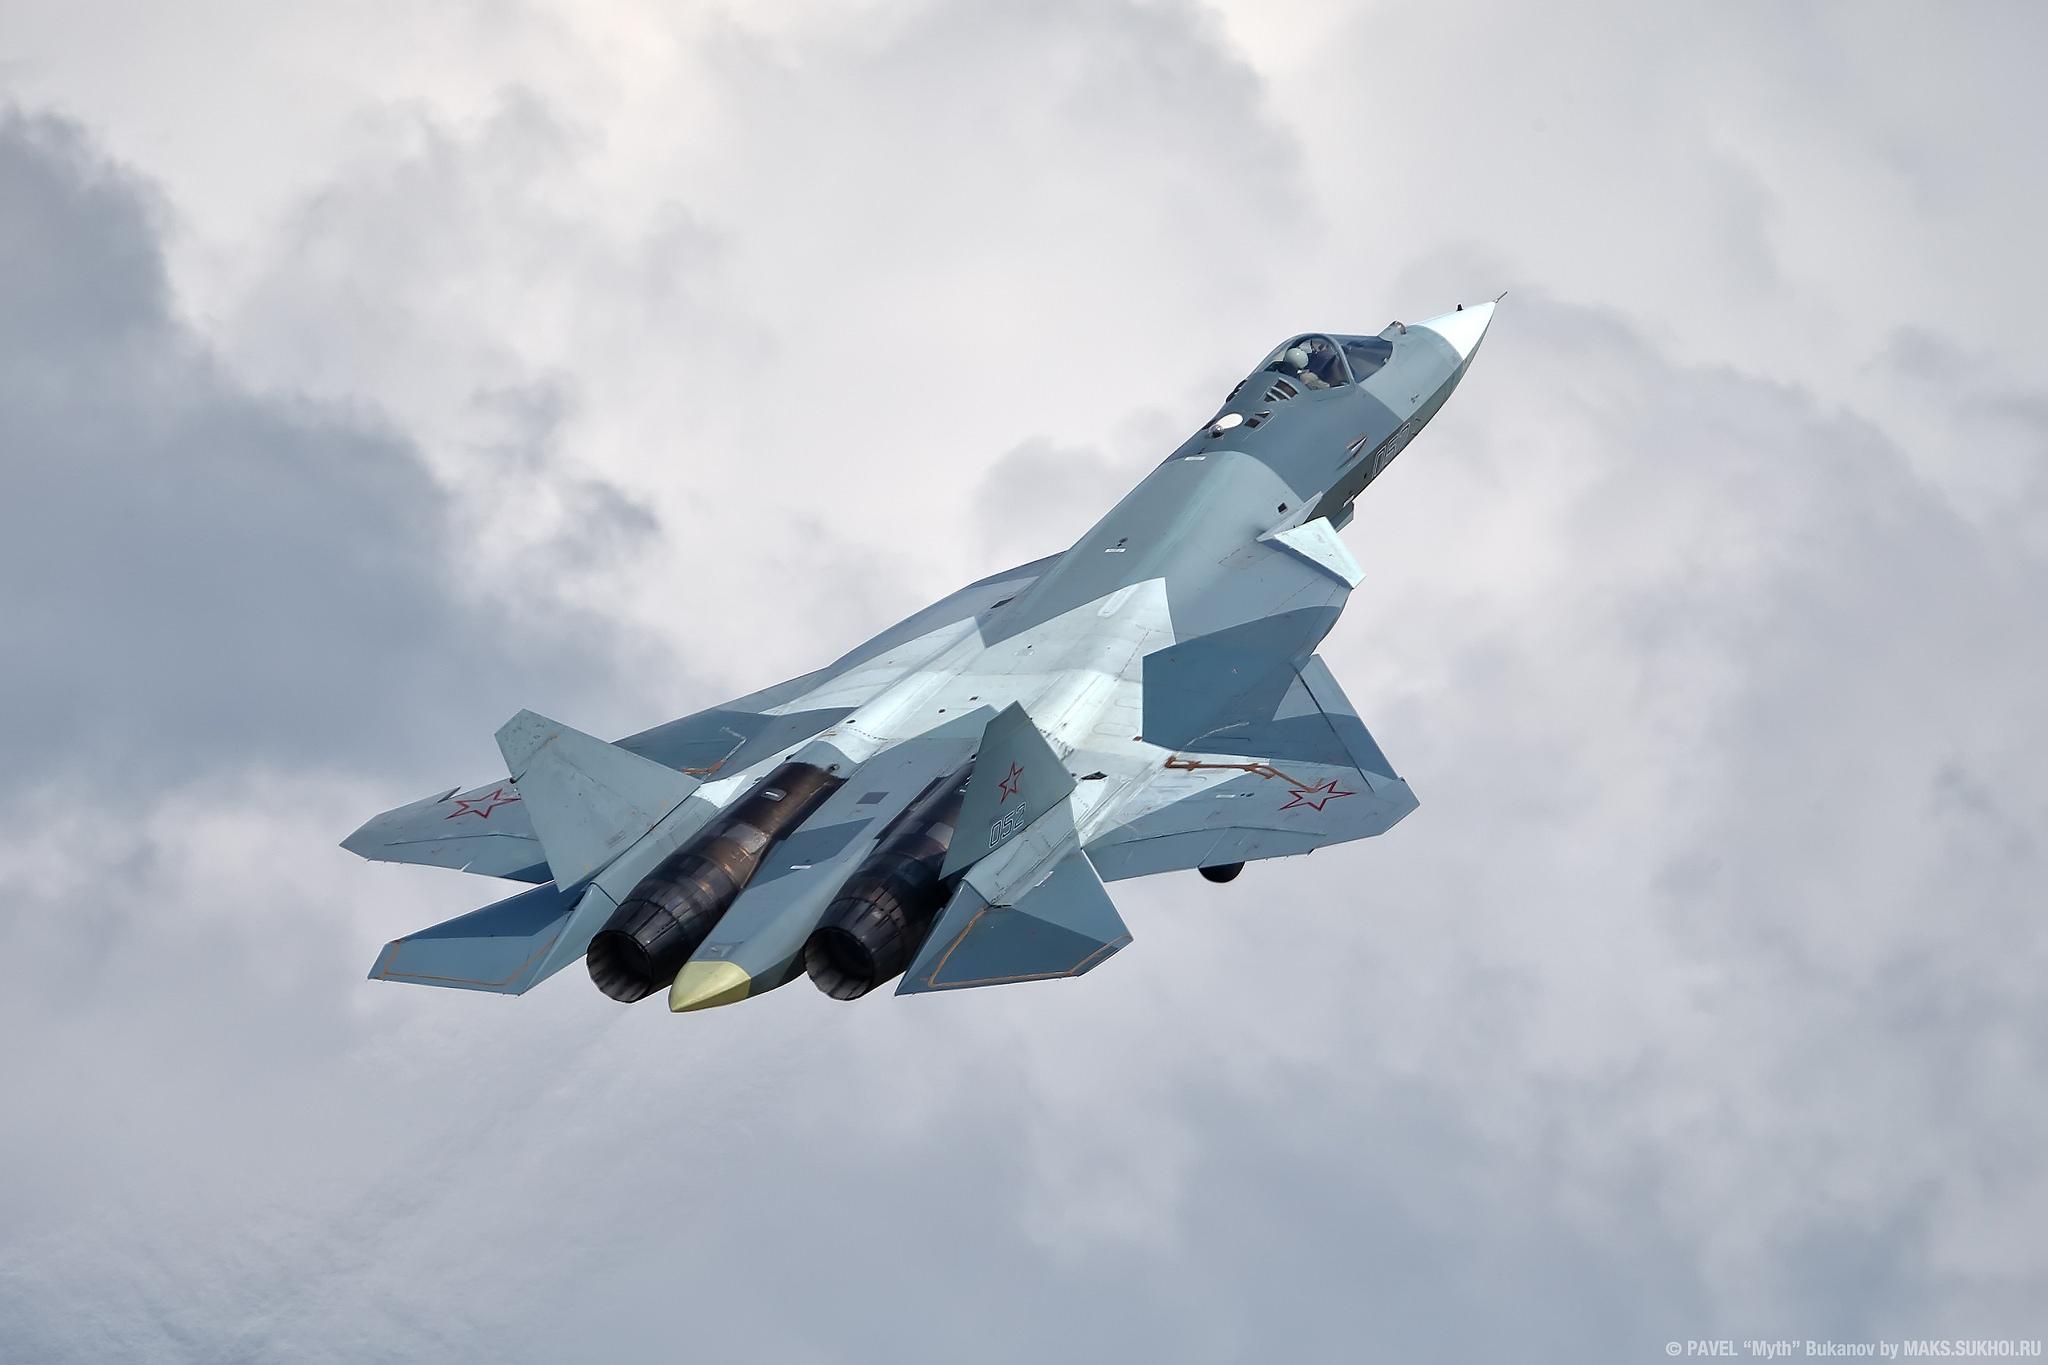 General 2048x1365 Russian Air Force Sukhoi Su-57 warplanes jet fighter clouds